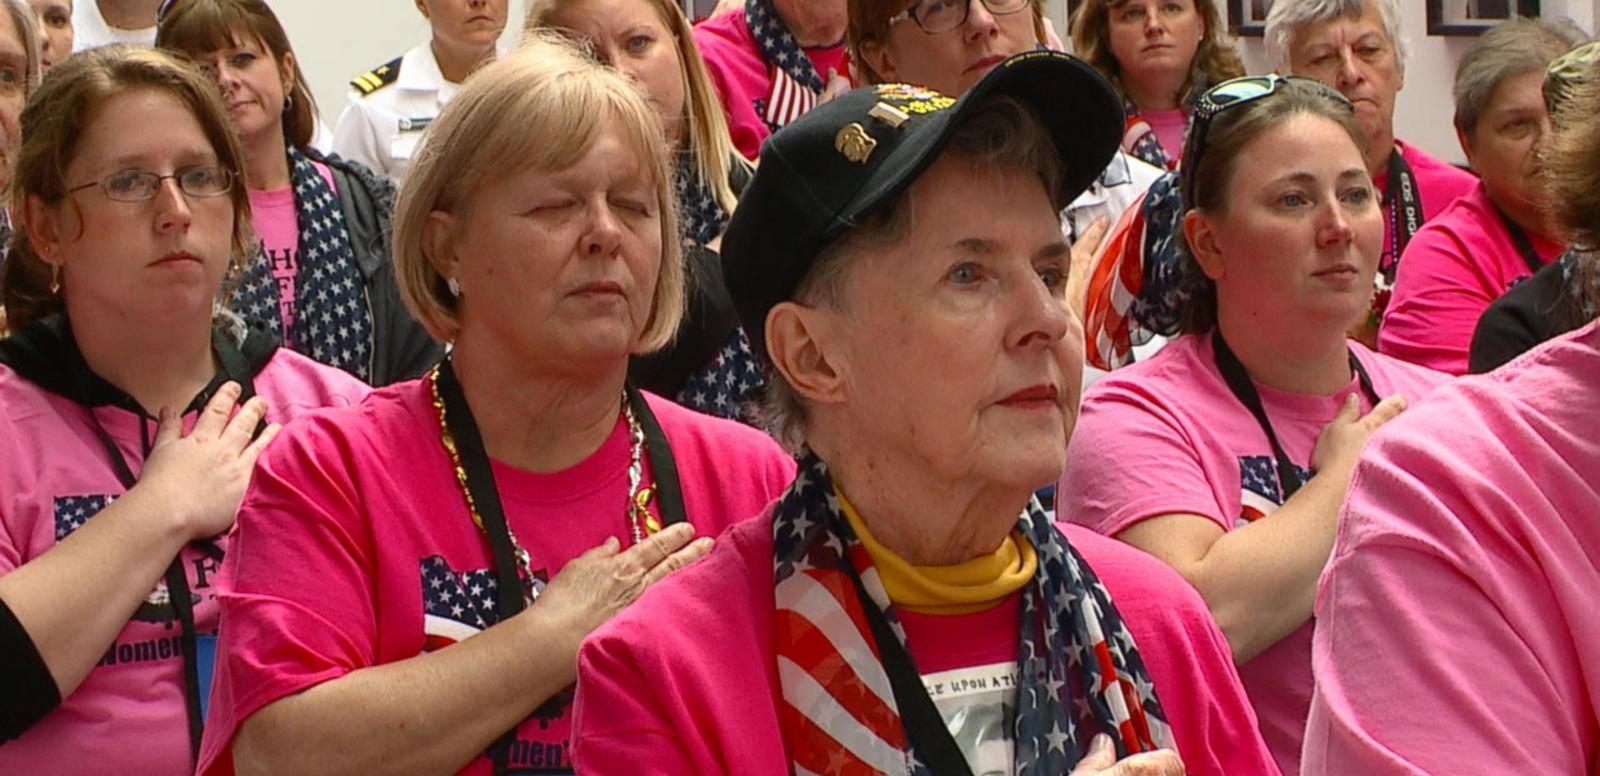 VIDEO: 140 Veterans Make History as First All-Female Honor Flight